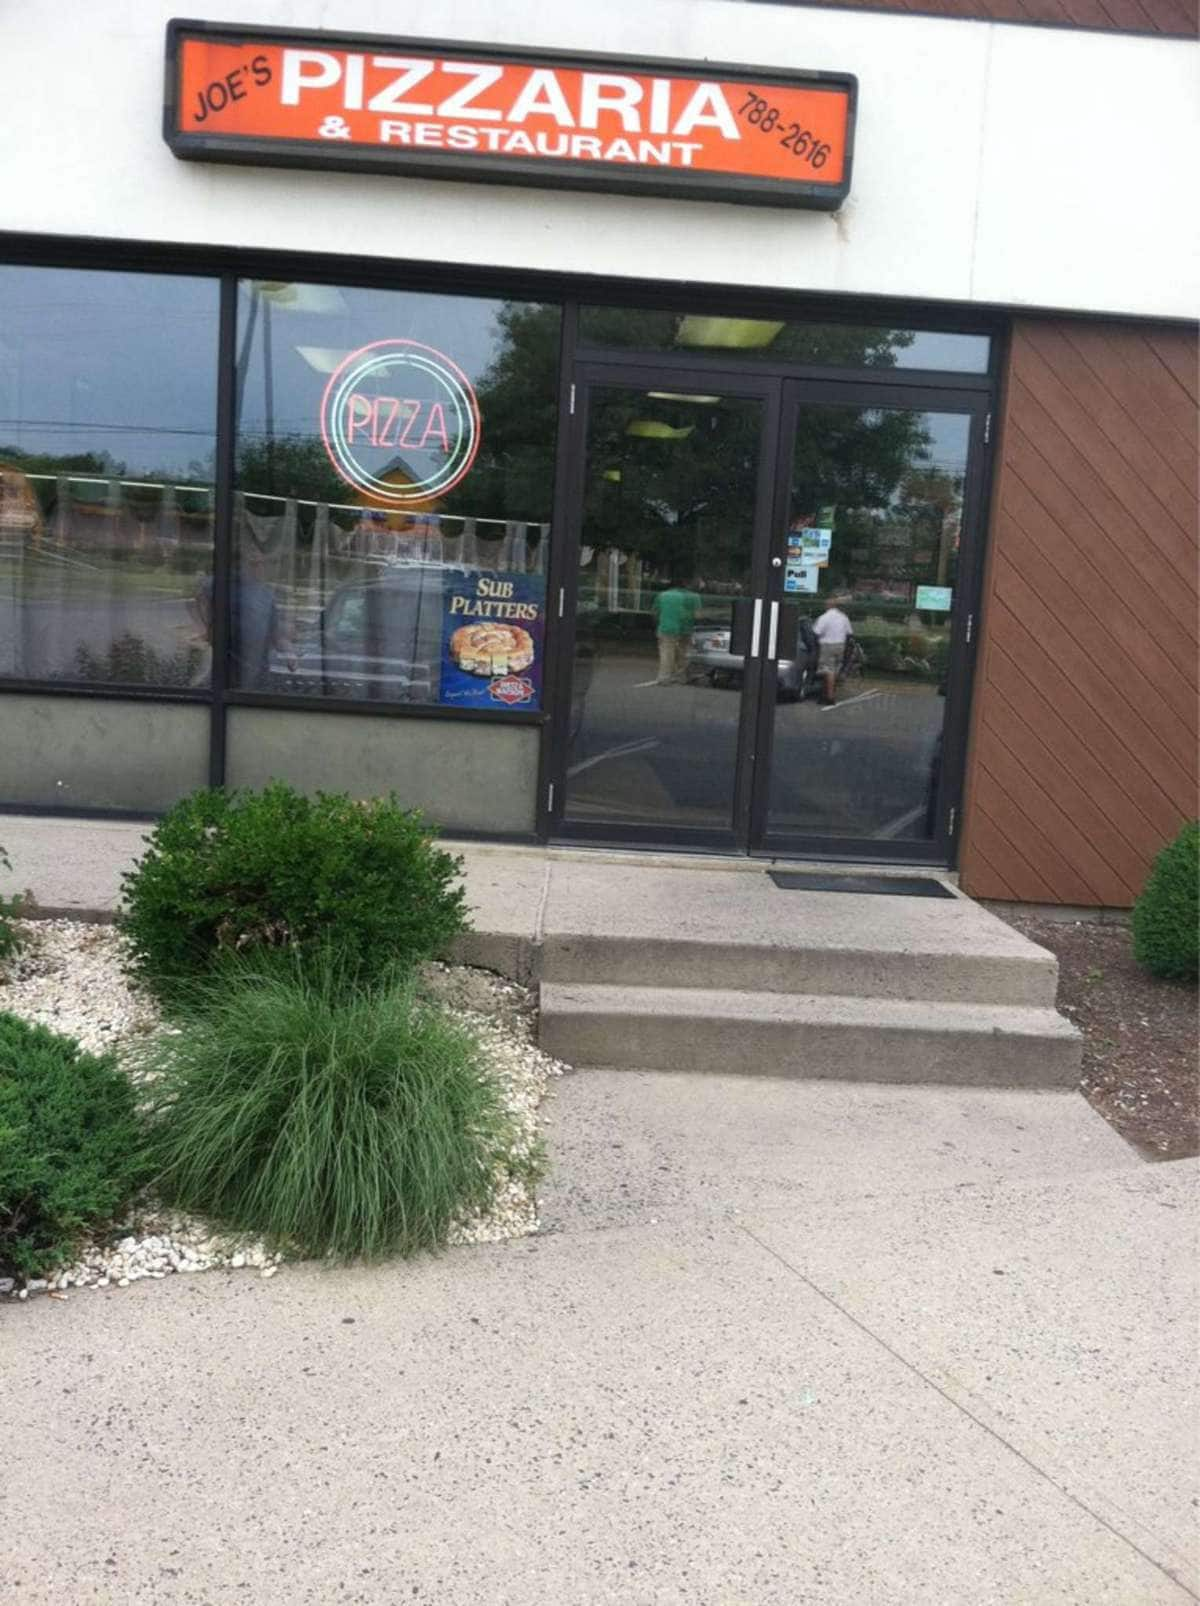 Joe's Pizza & Restaurant Incorporated